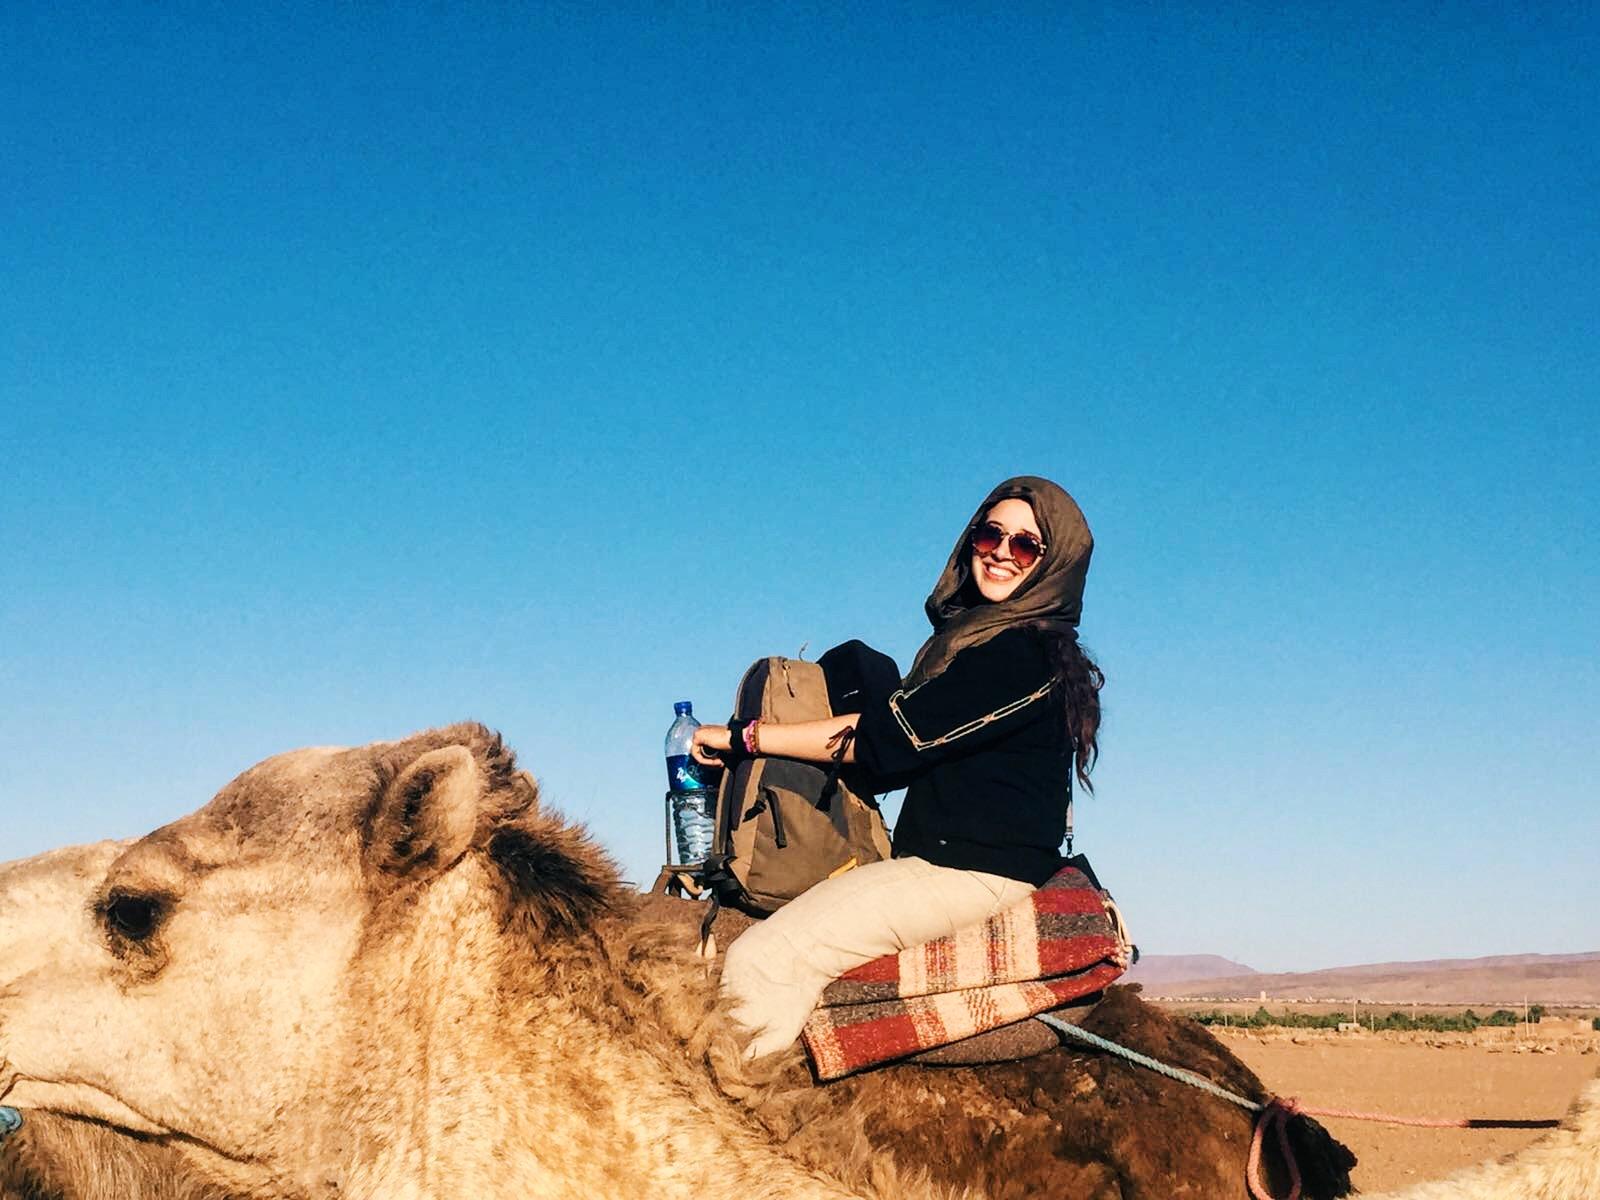 got photobombed by a camel, lol..